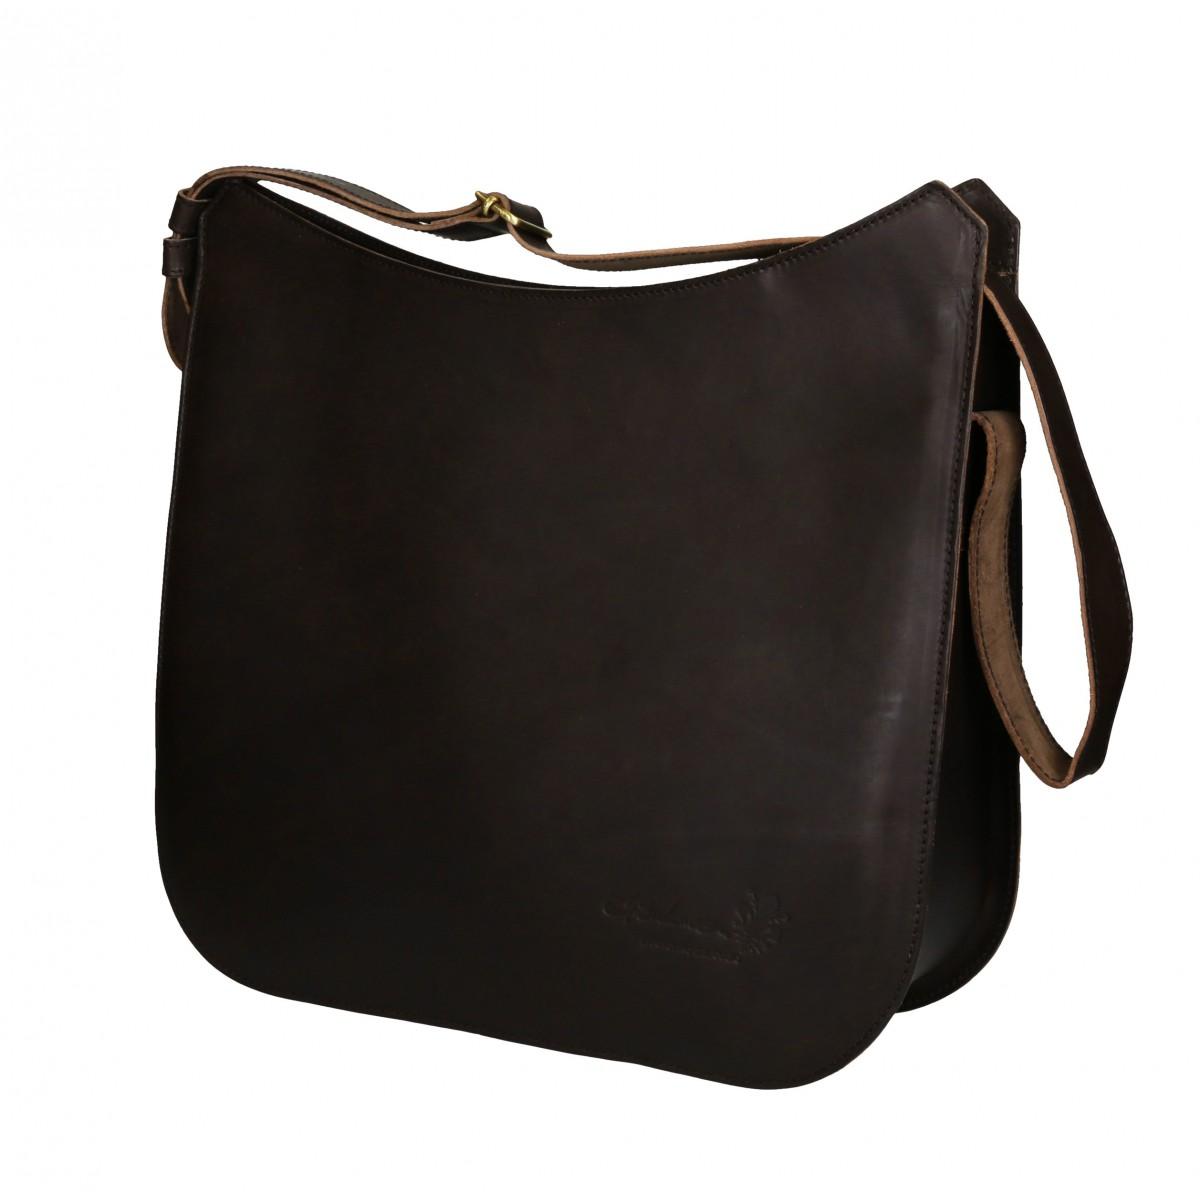 sac en cuir marron bandouli re fait main en italie. Black Bedroom Furniture Sets. Home Design Ideas